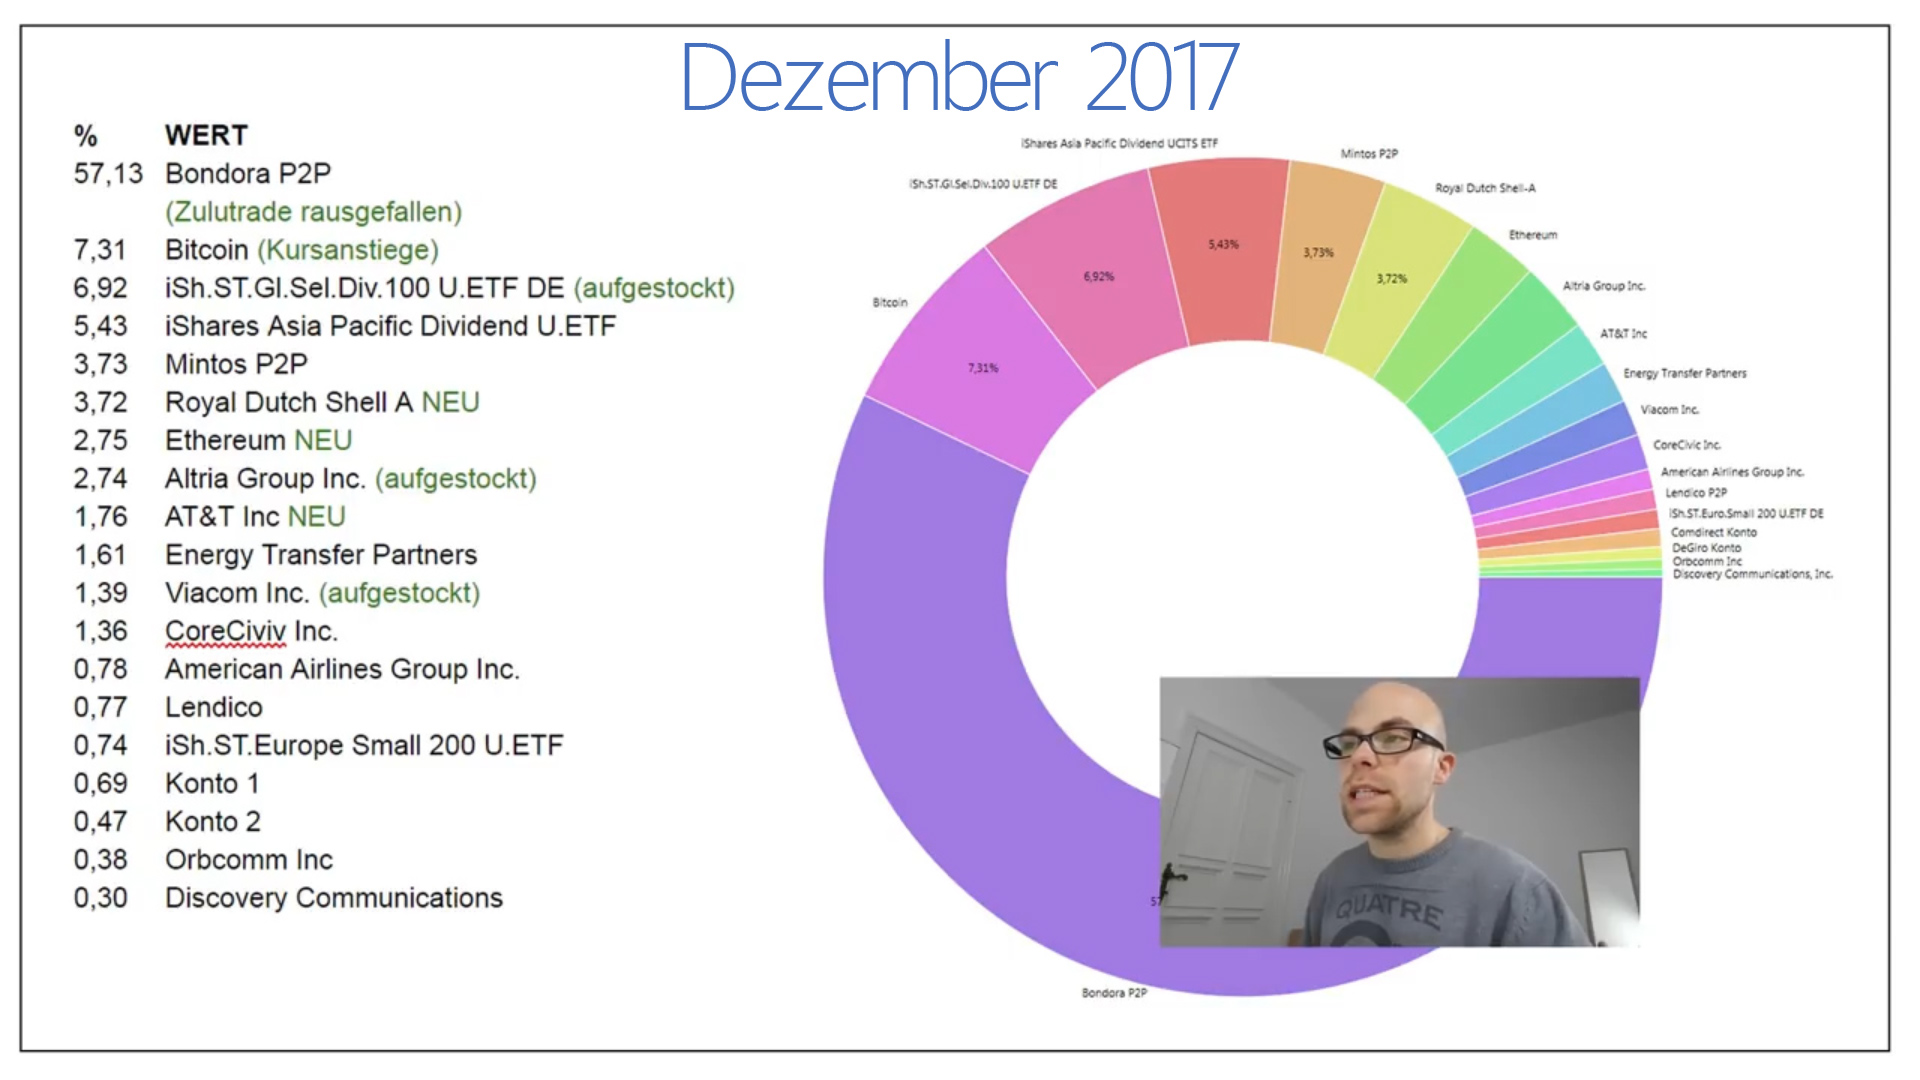 portfolio dez 2017.jpg